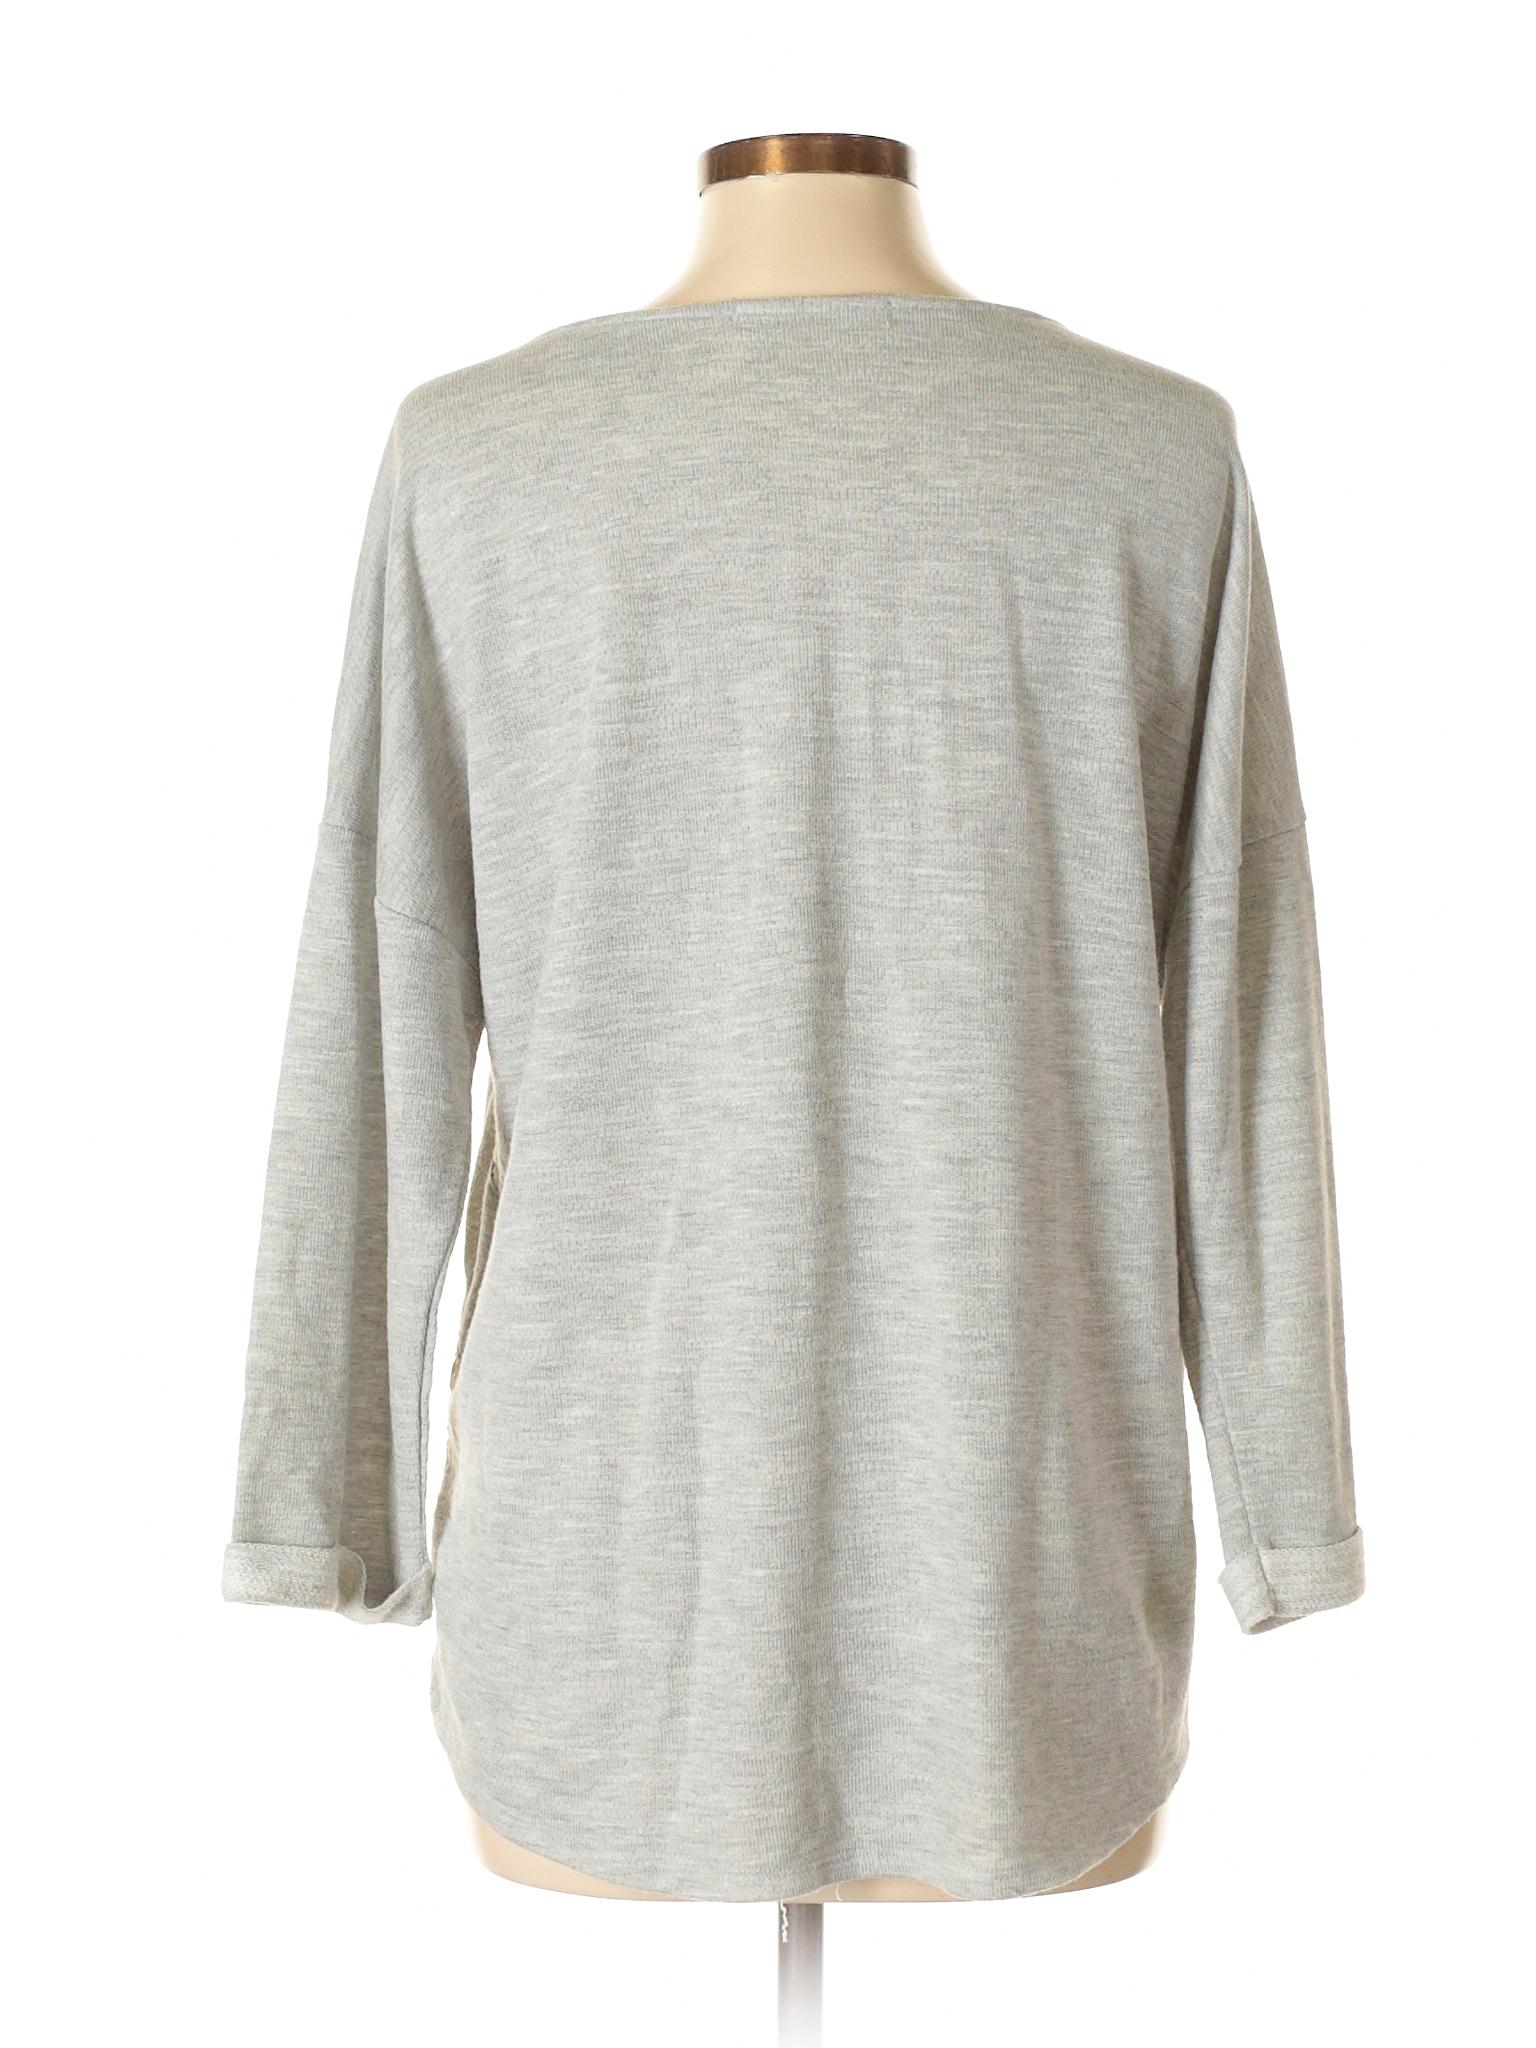 Sweater Everleigh Pullover Everleigh Boutique winter Pullover winter Boutique Sweater qxdYvw6qCn